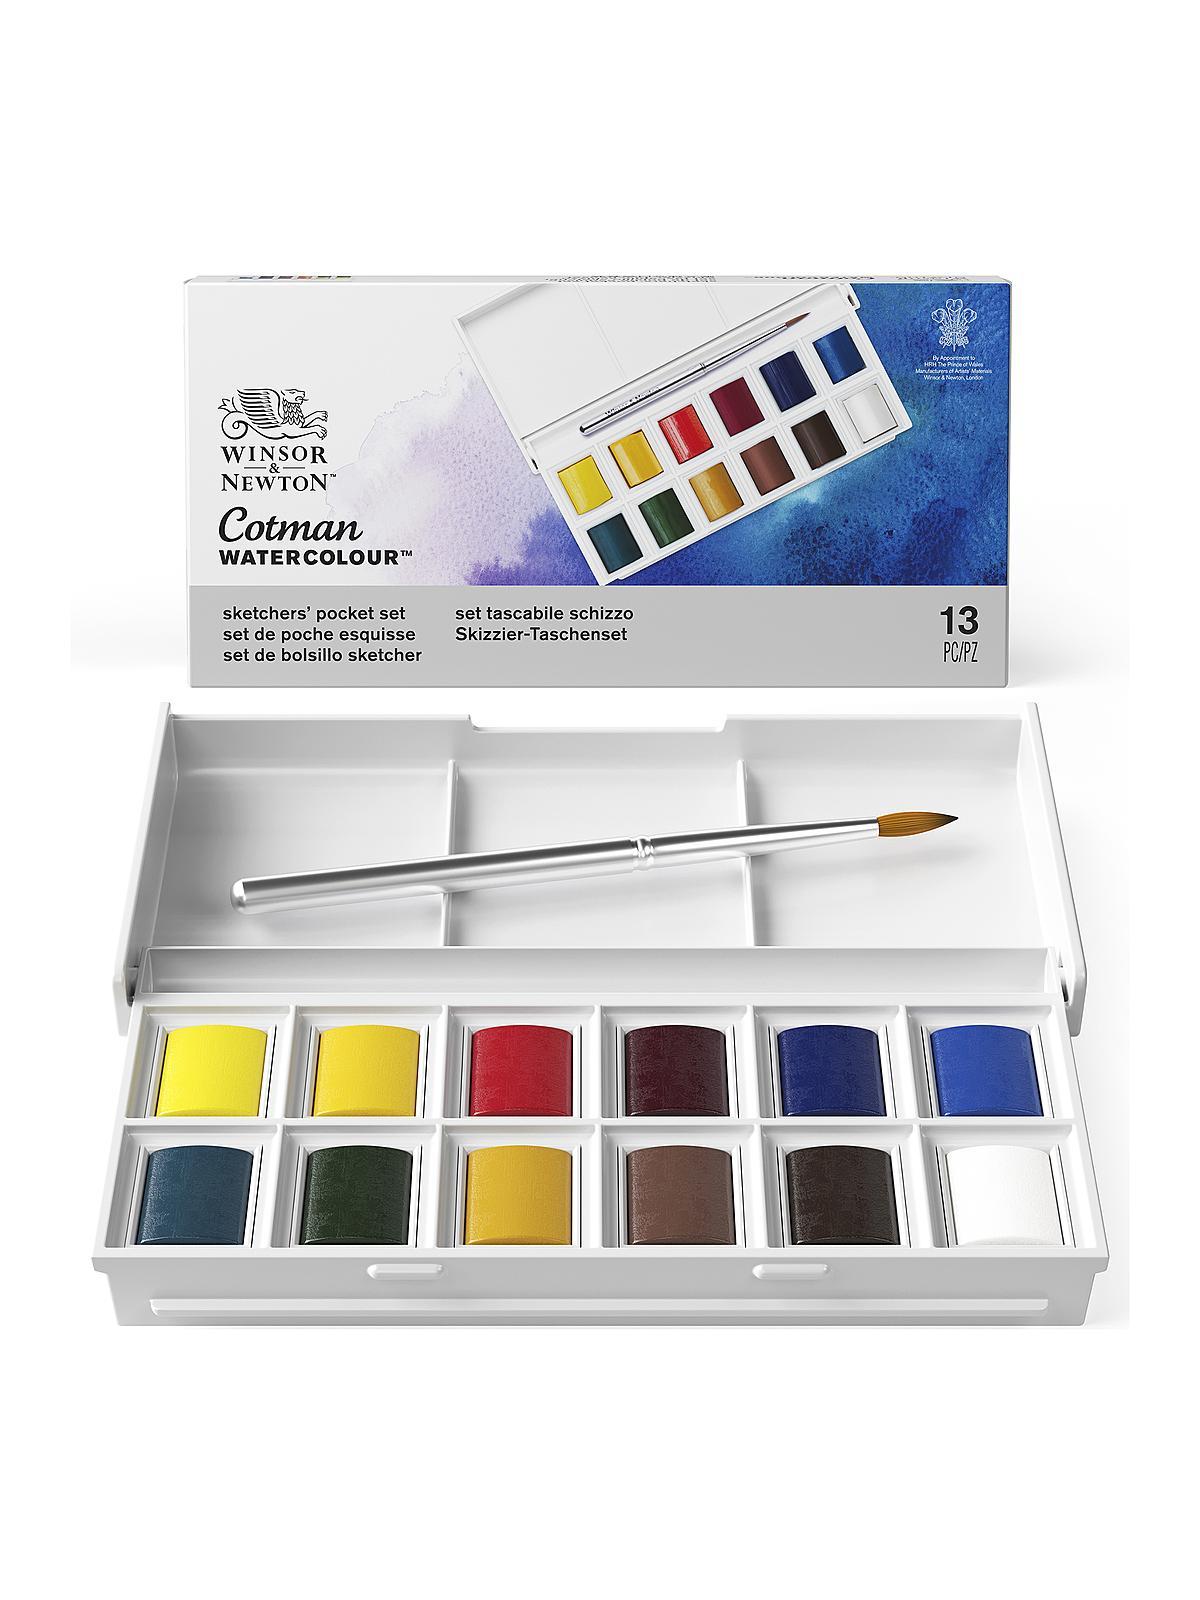 Winsor & Newton - Cotman Water Colour Sketchers' Pocket Box